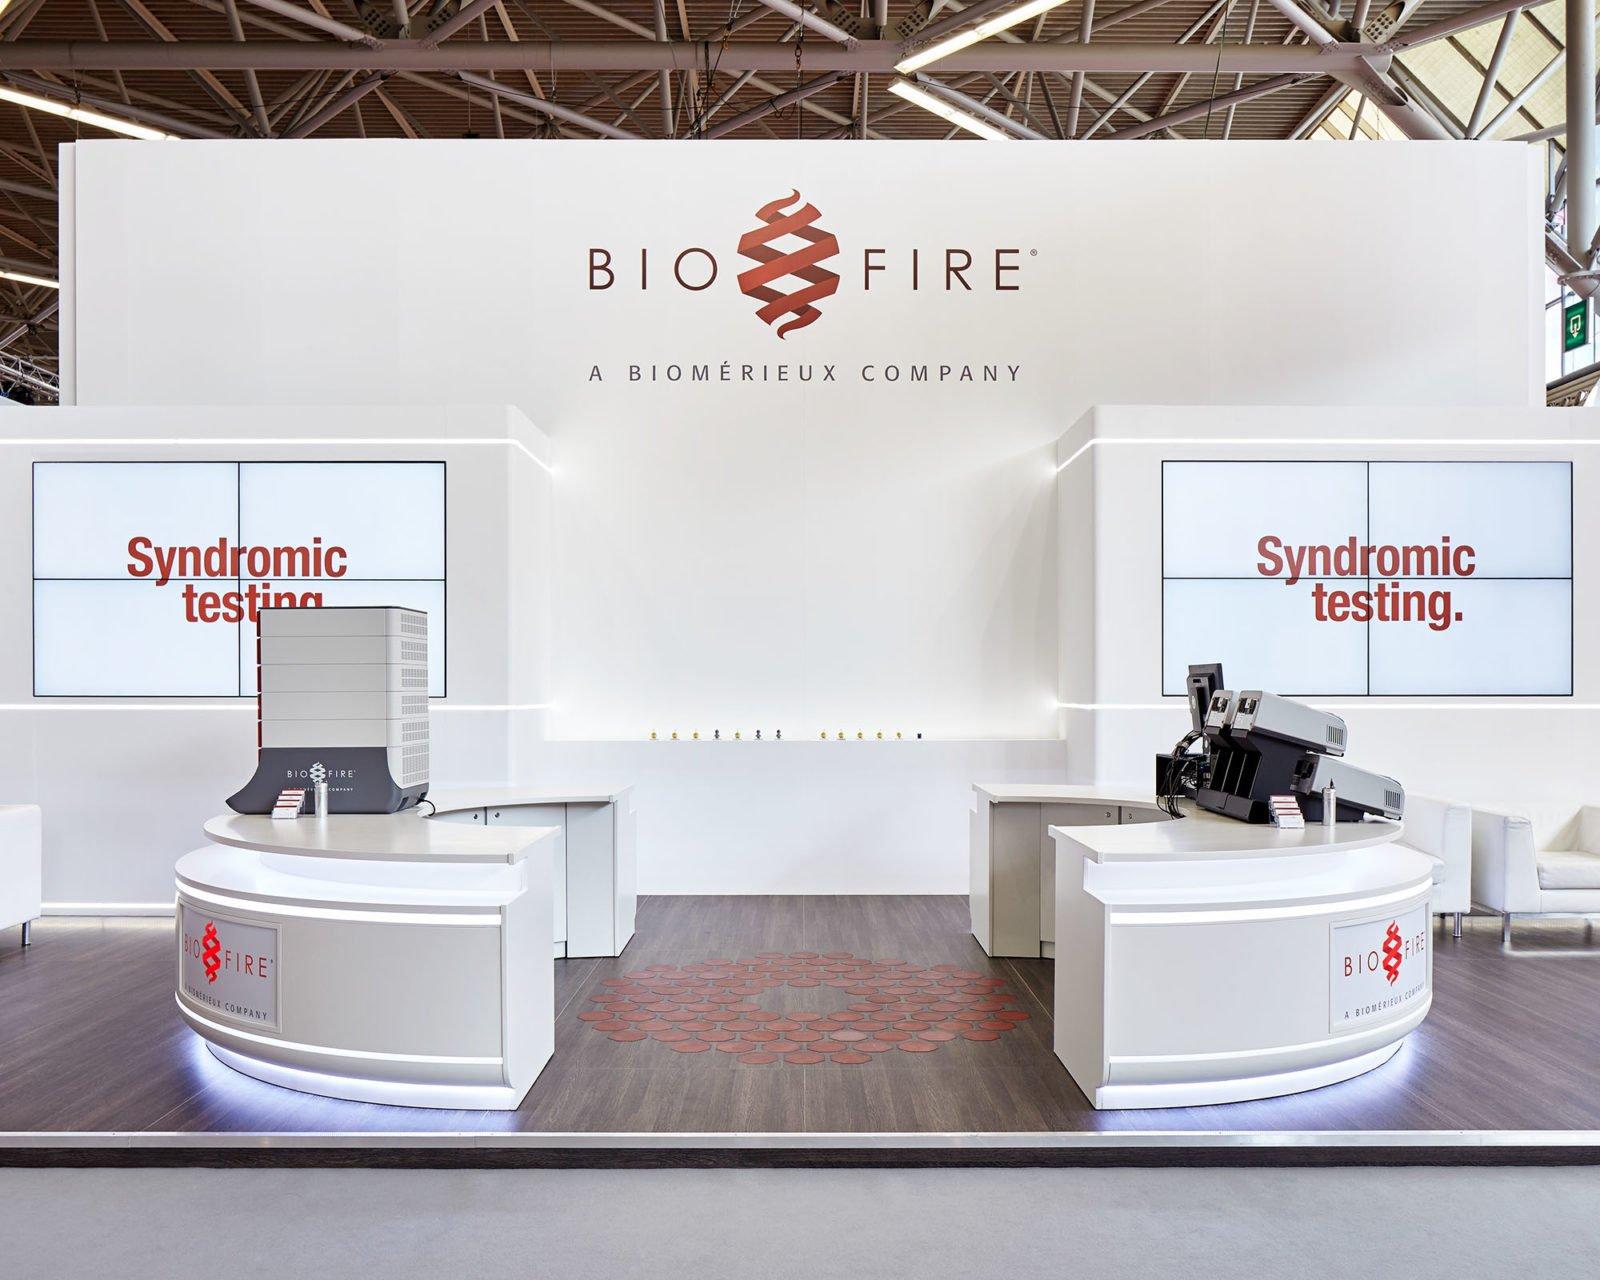 biofire-messebau-siehr